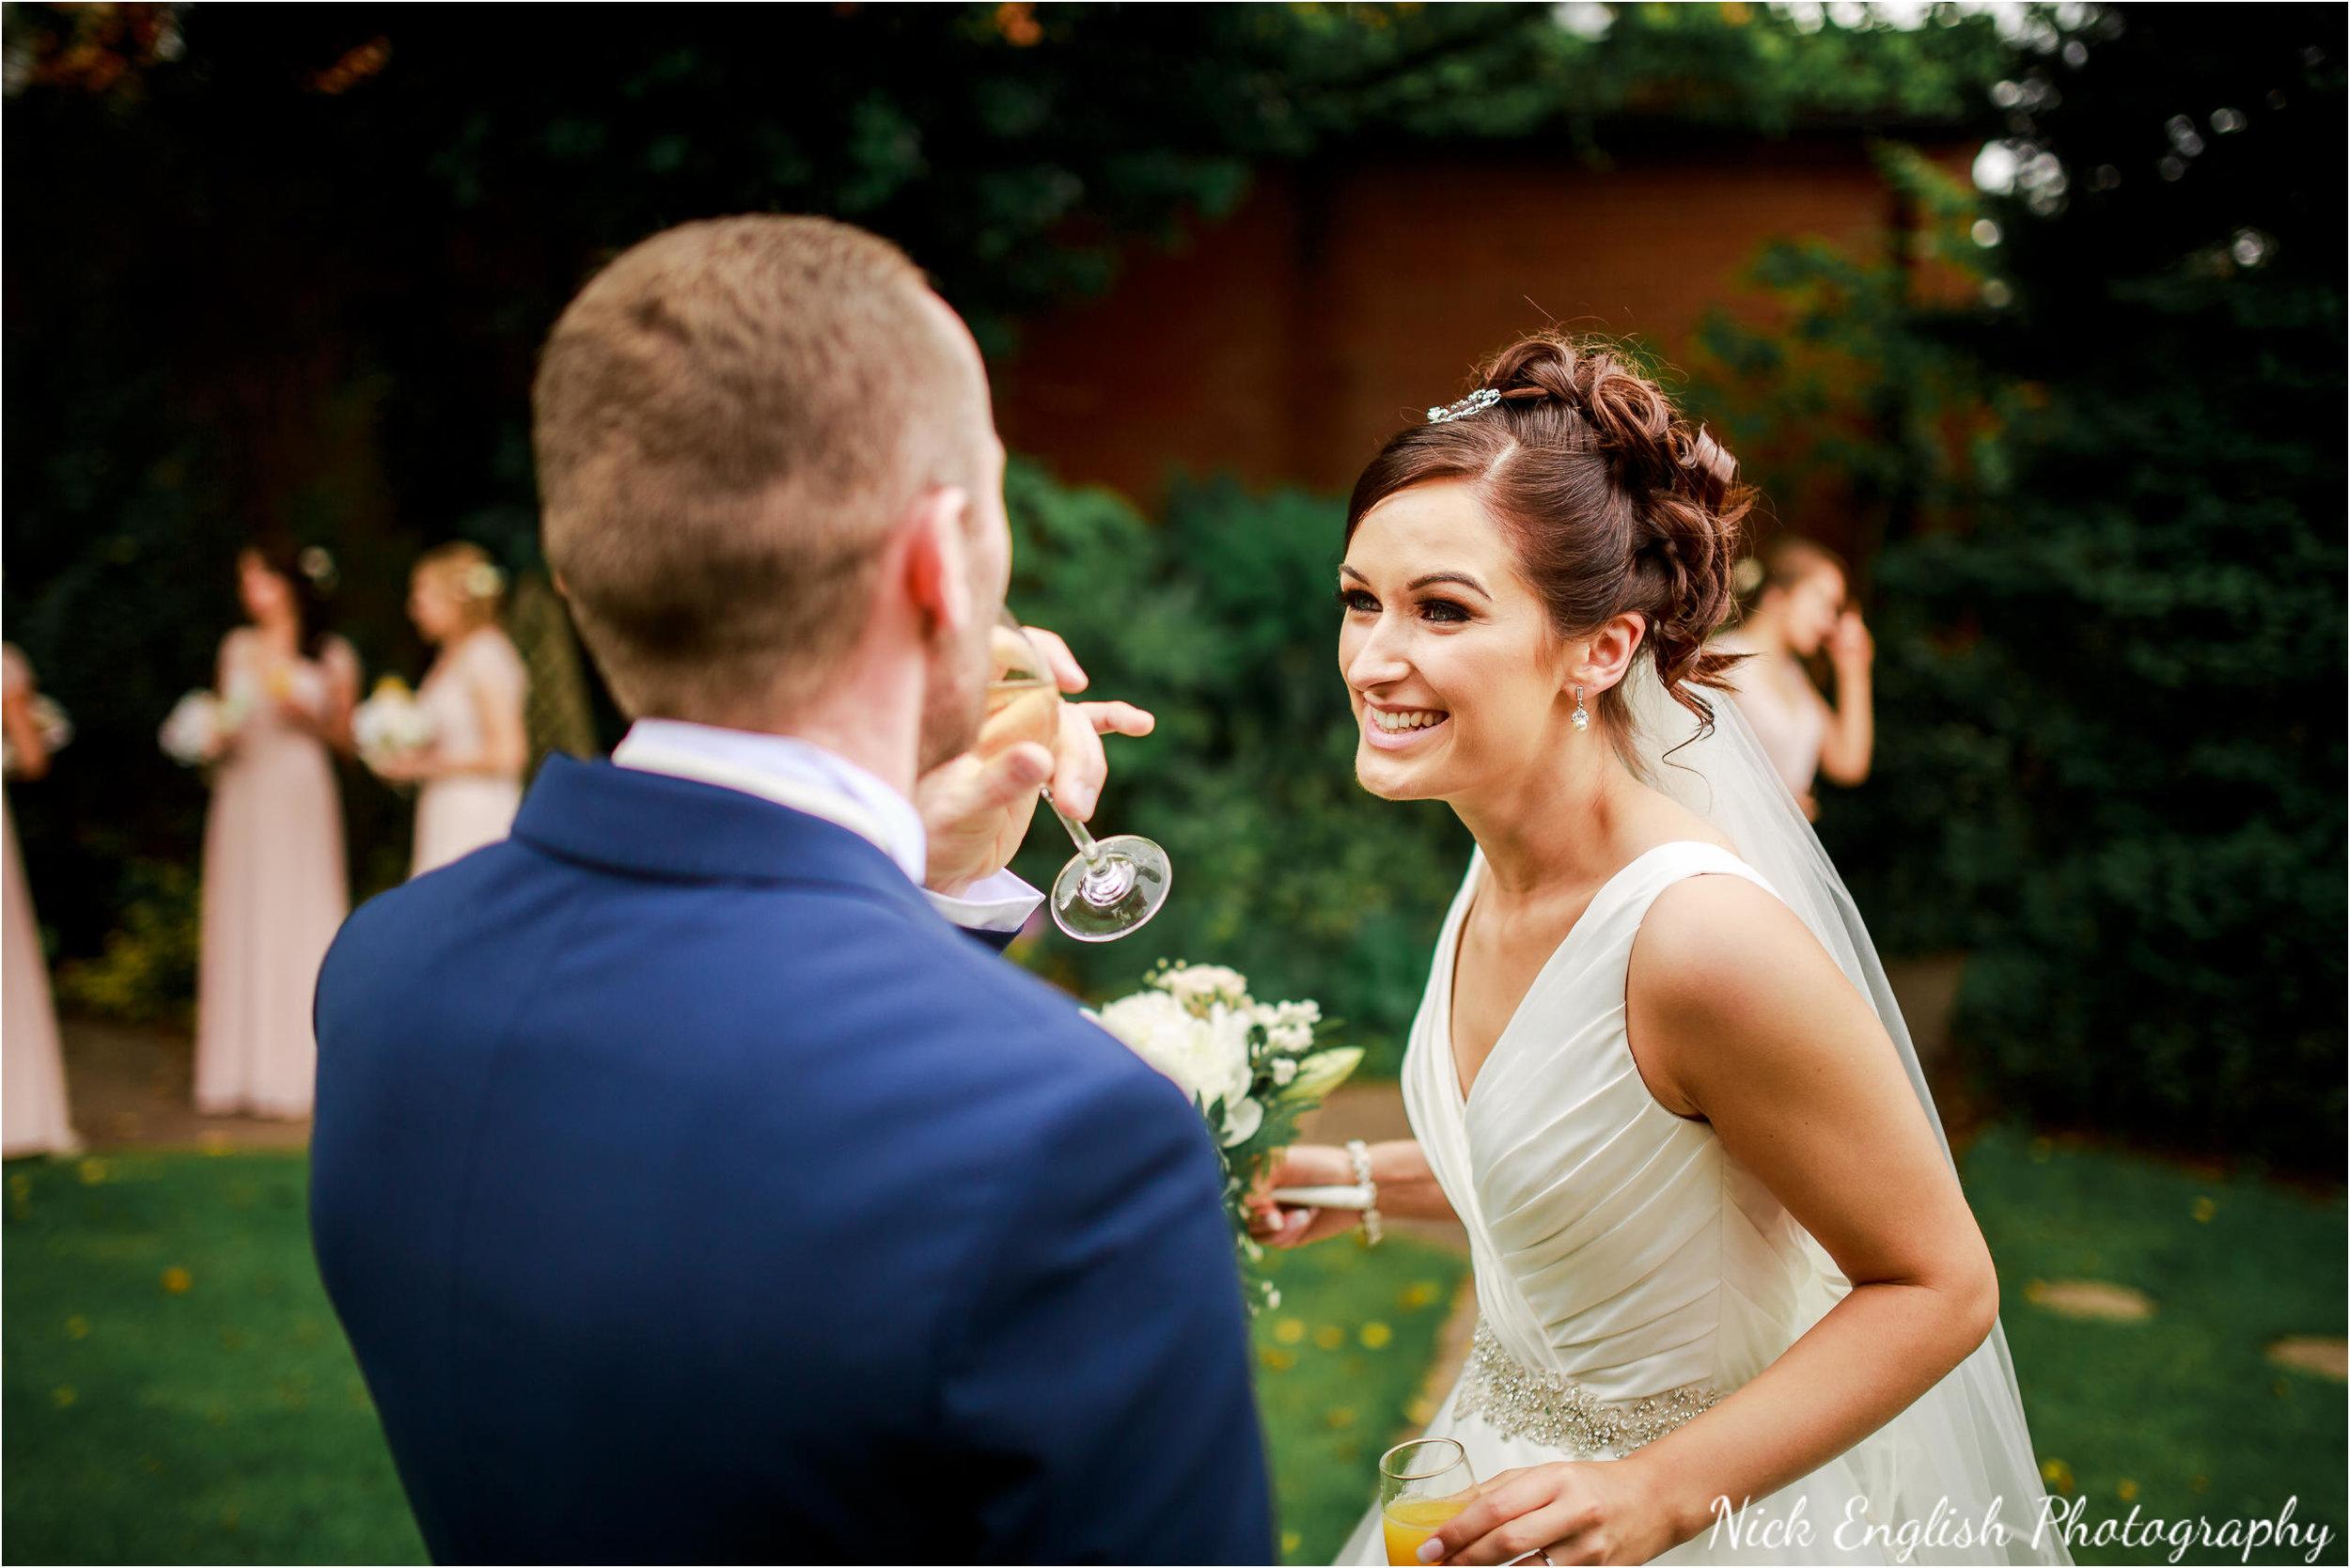 Emily David Wedding Photographs at Barton Grange Preston by Nick English Photography 93jpg.jpeg